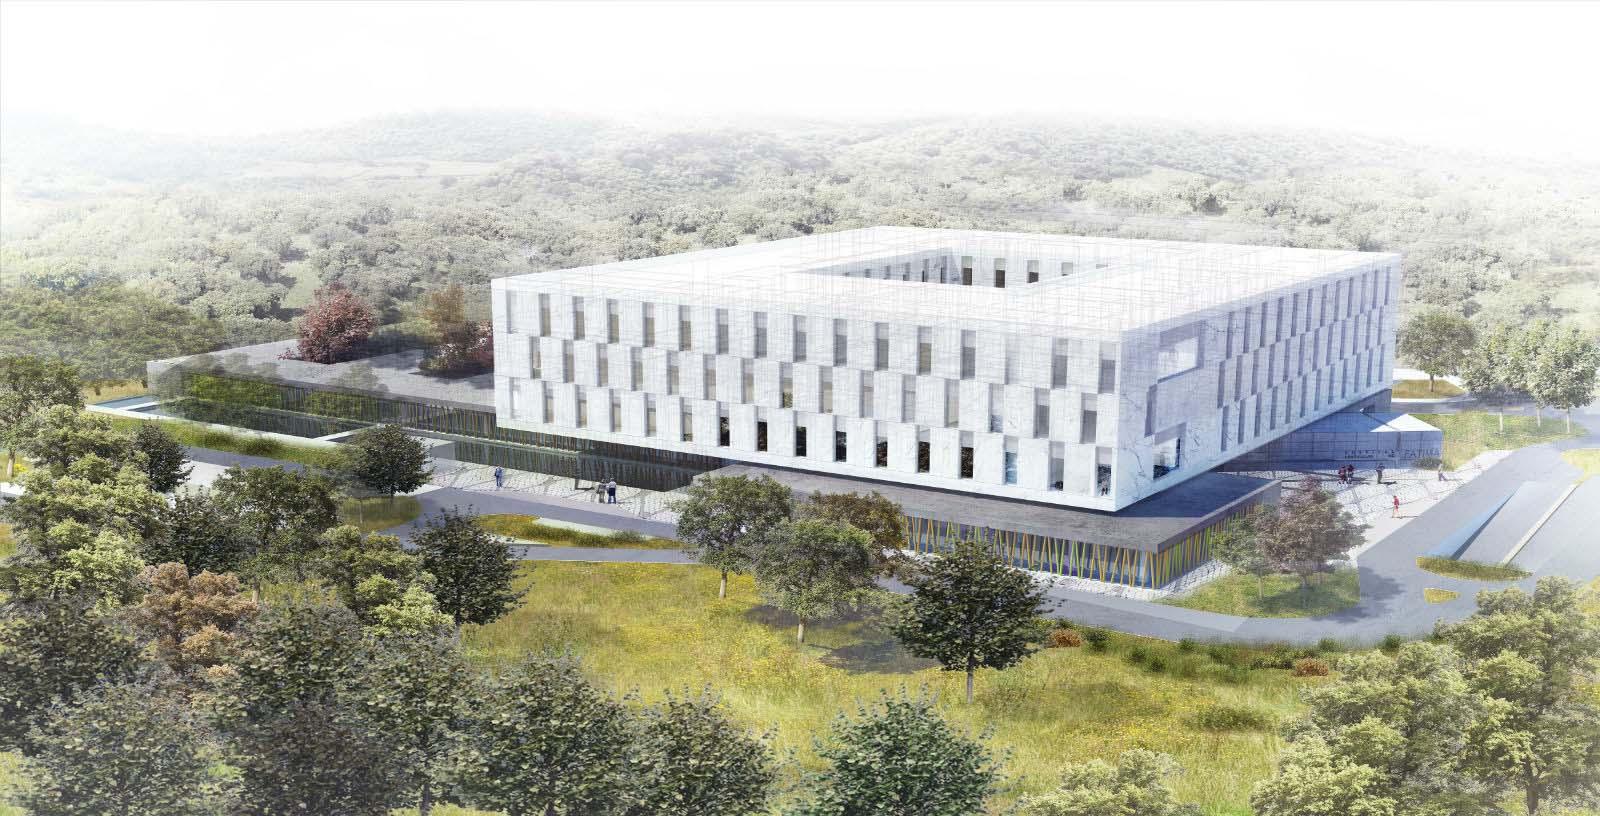 PRIVATE_HOSPITAL_OF_FATIMA_PORTUGAL_02_Architecture_IDOM_Copyright